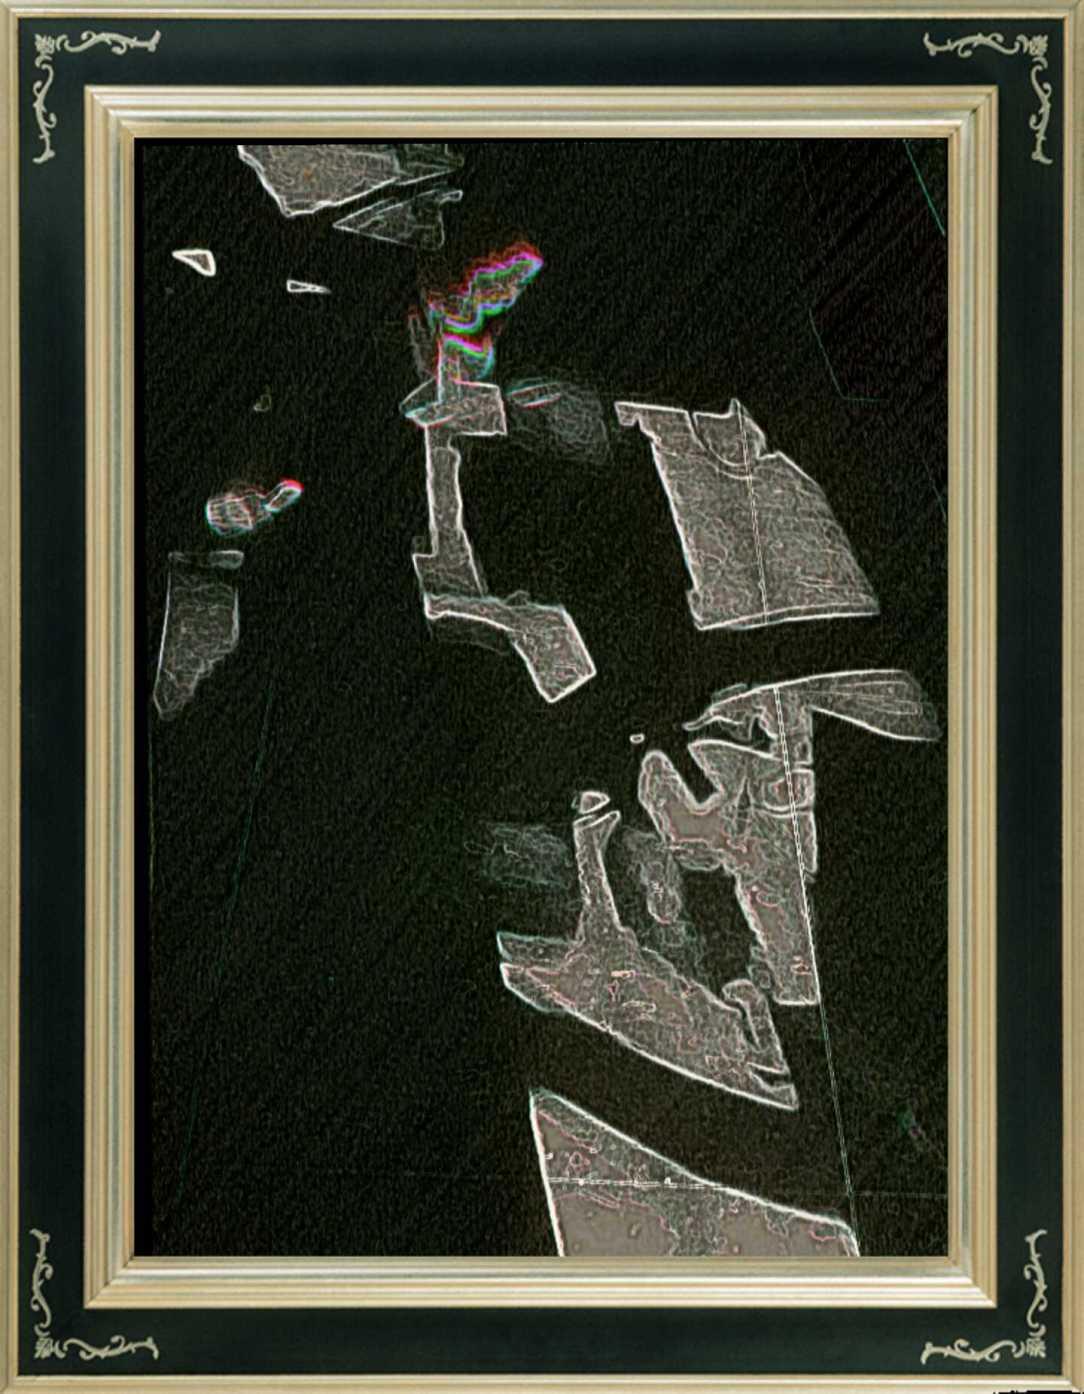 Cascading Shadows by R.M.Benson